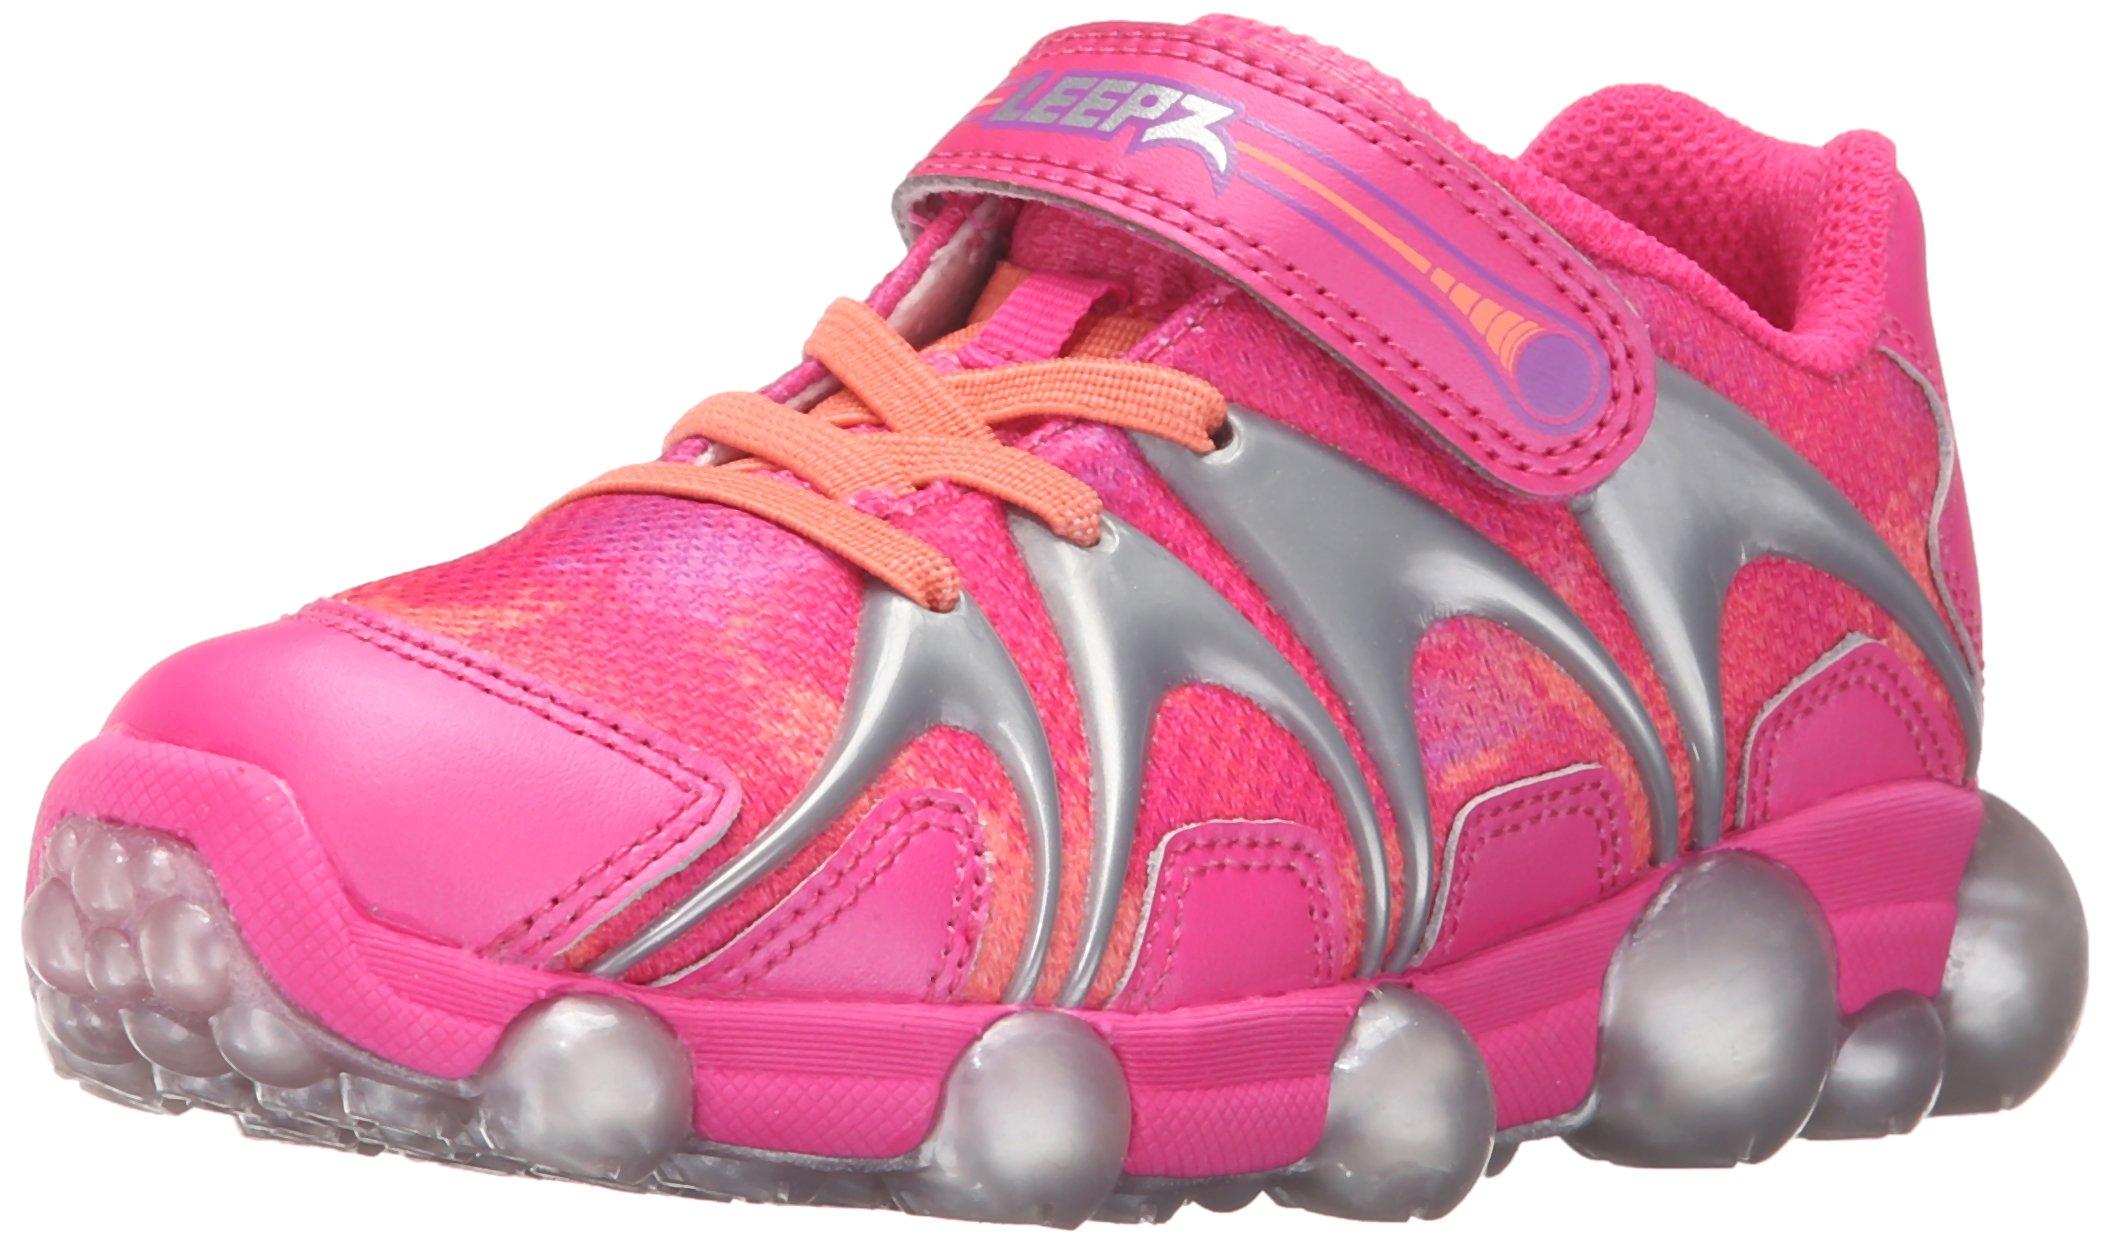 Stride Rite Leepz Light Up Sneaker (Toddler/Little Kid),Pink,11.5 M US Little Kid